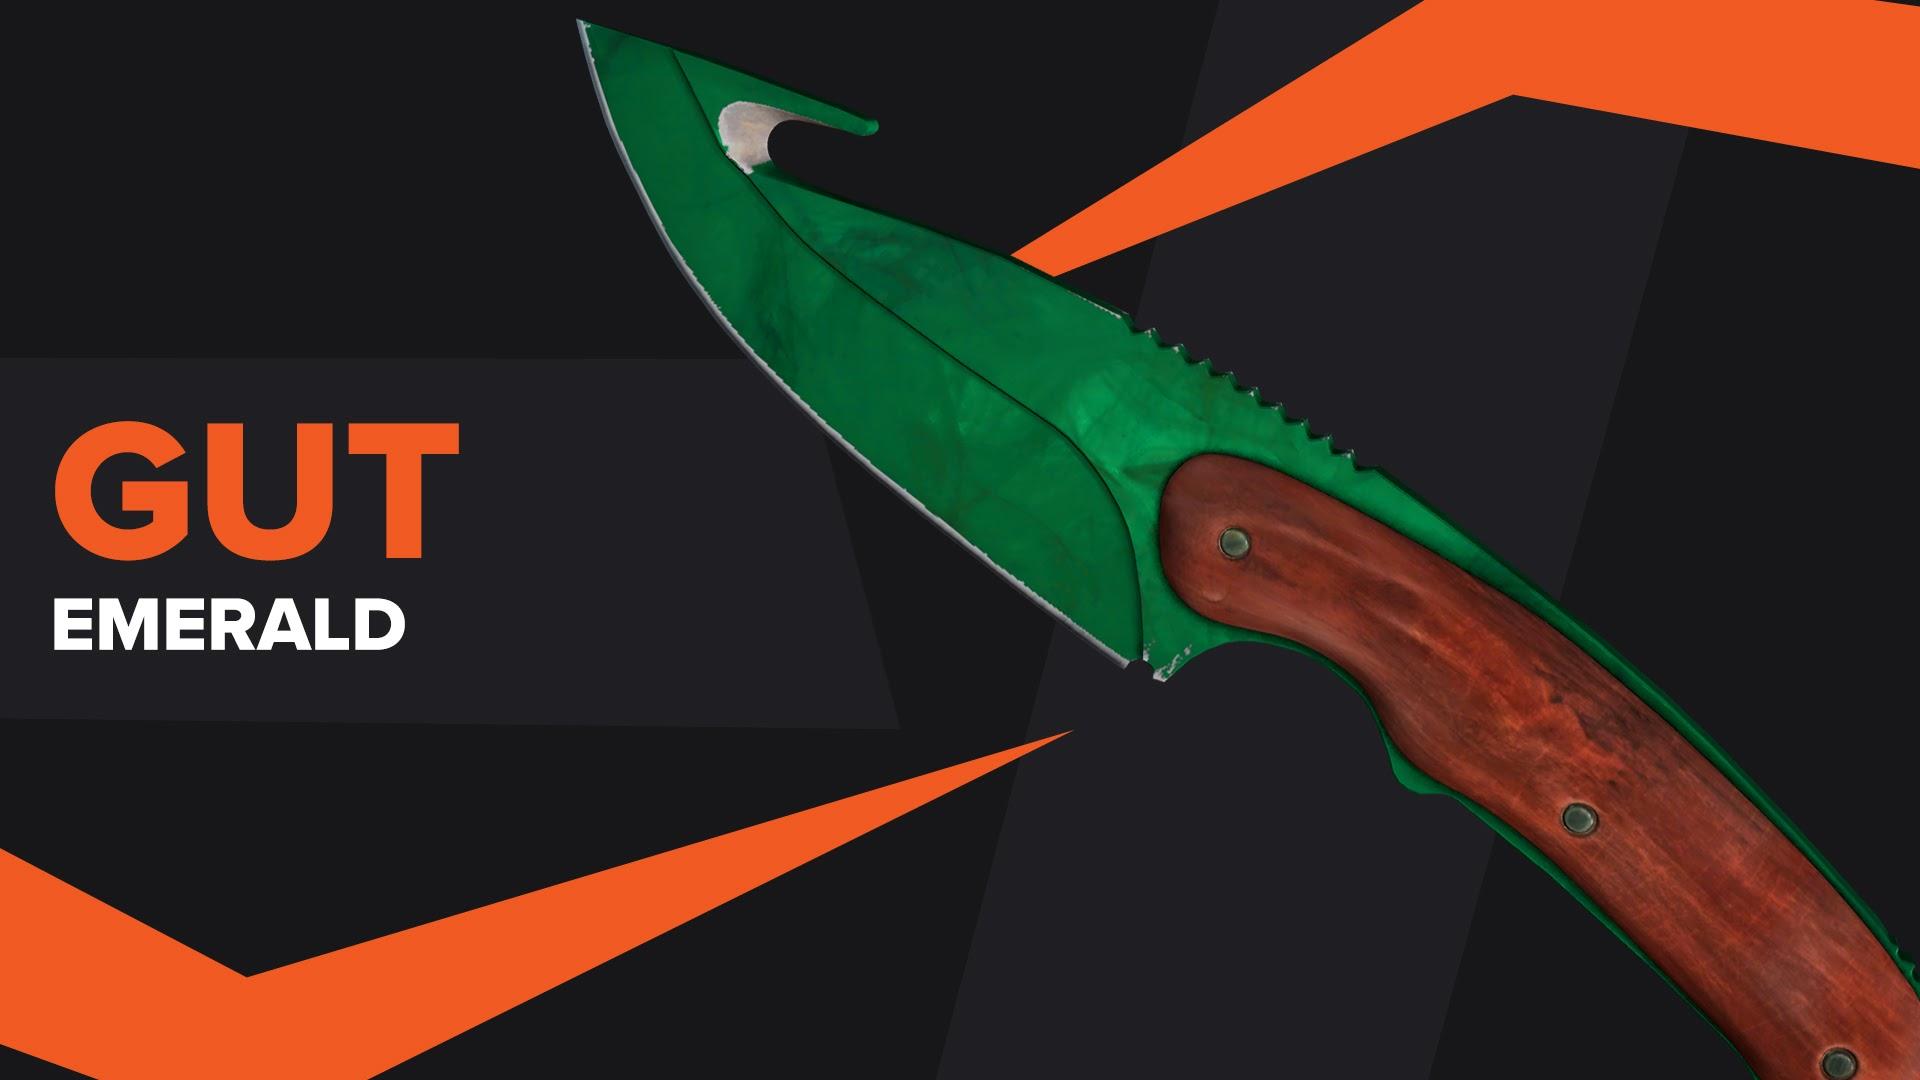 Gut Knife Emerald CSGO Skin